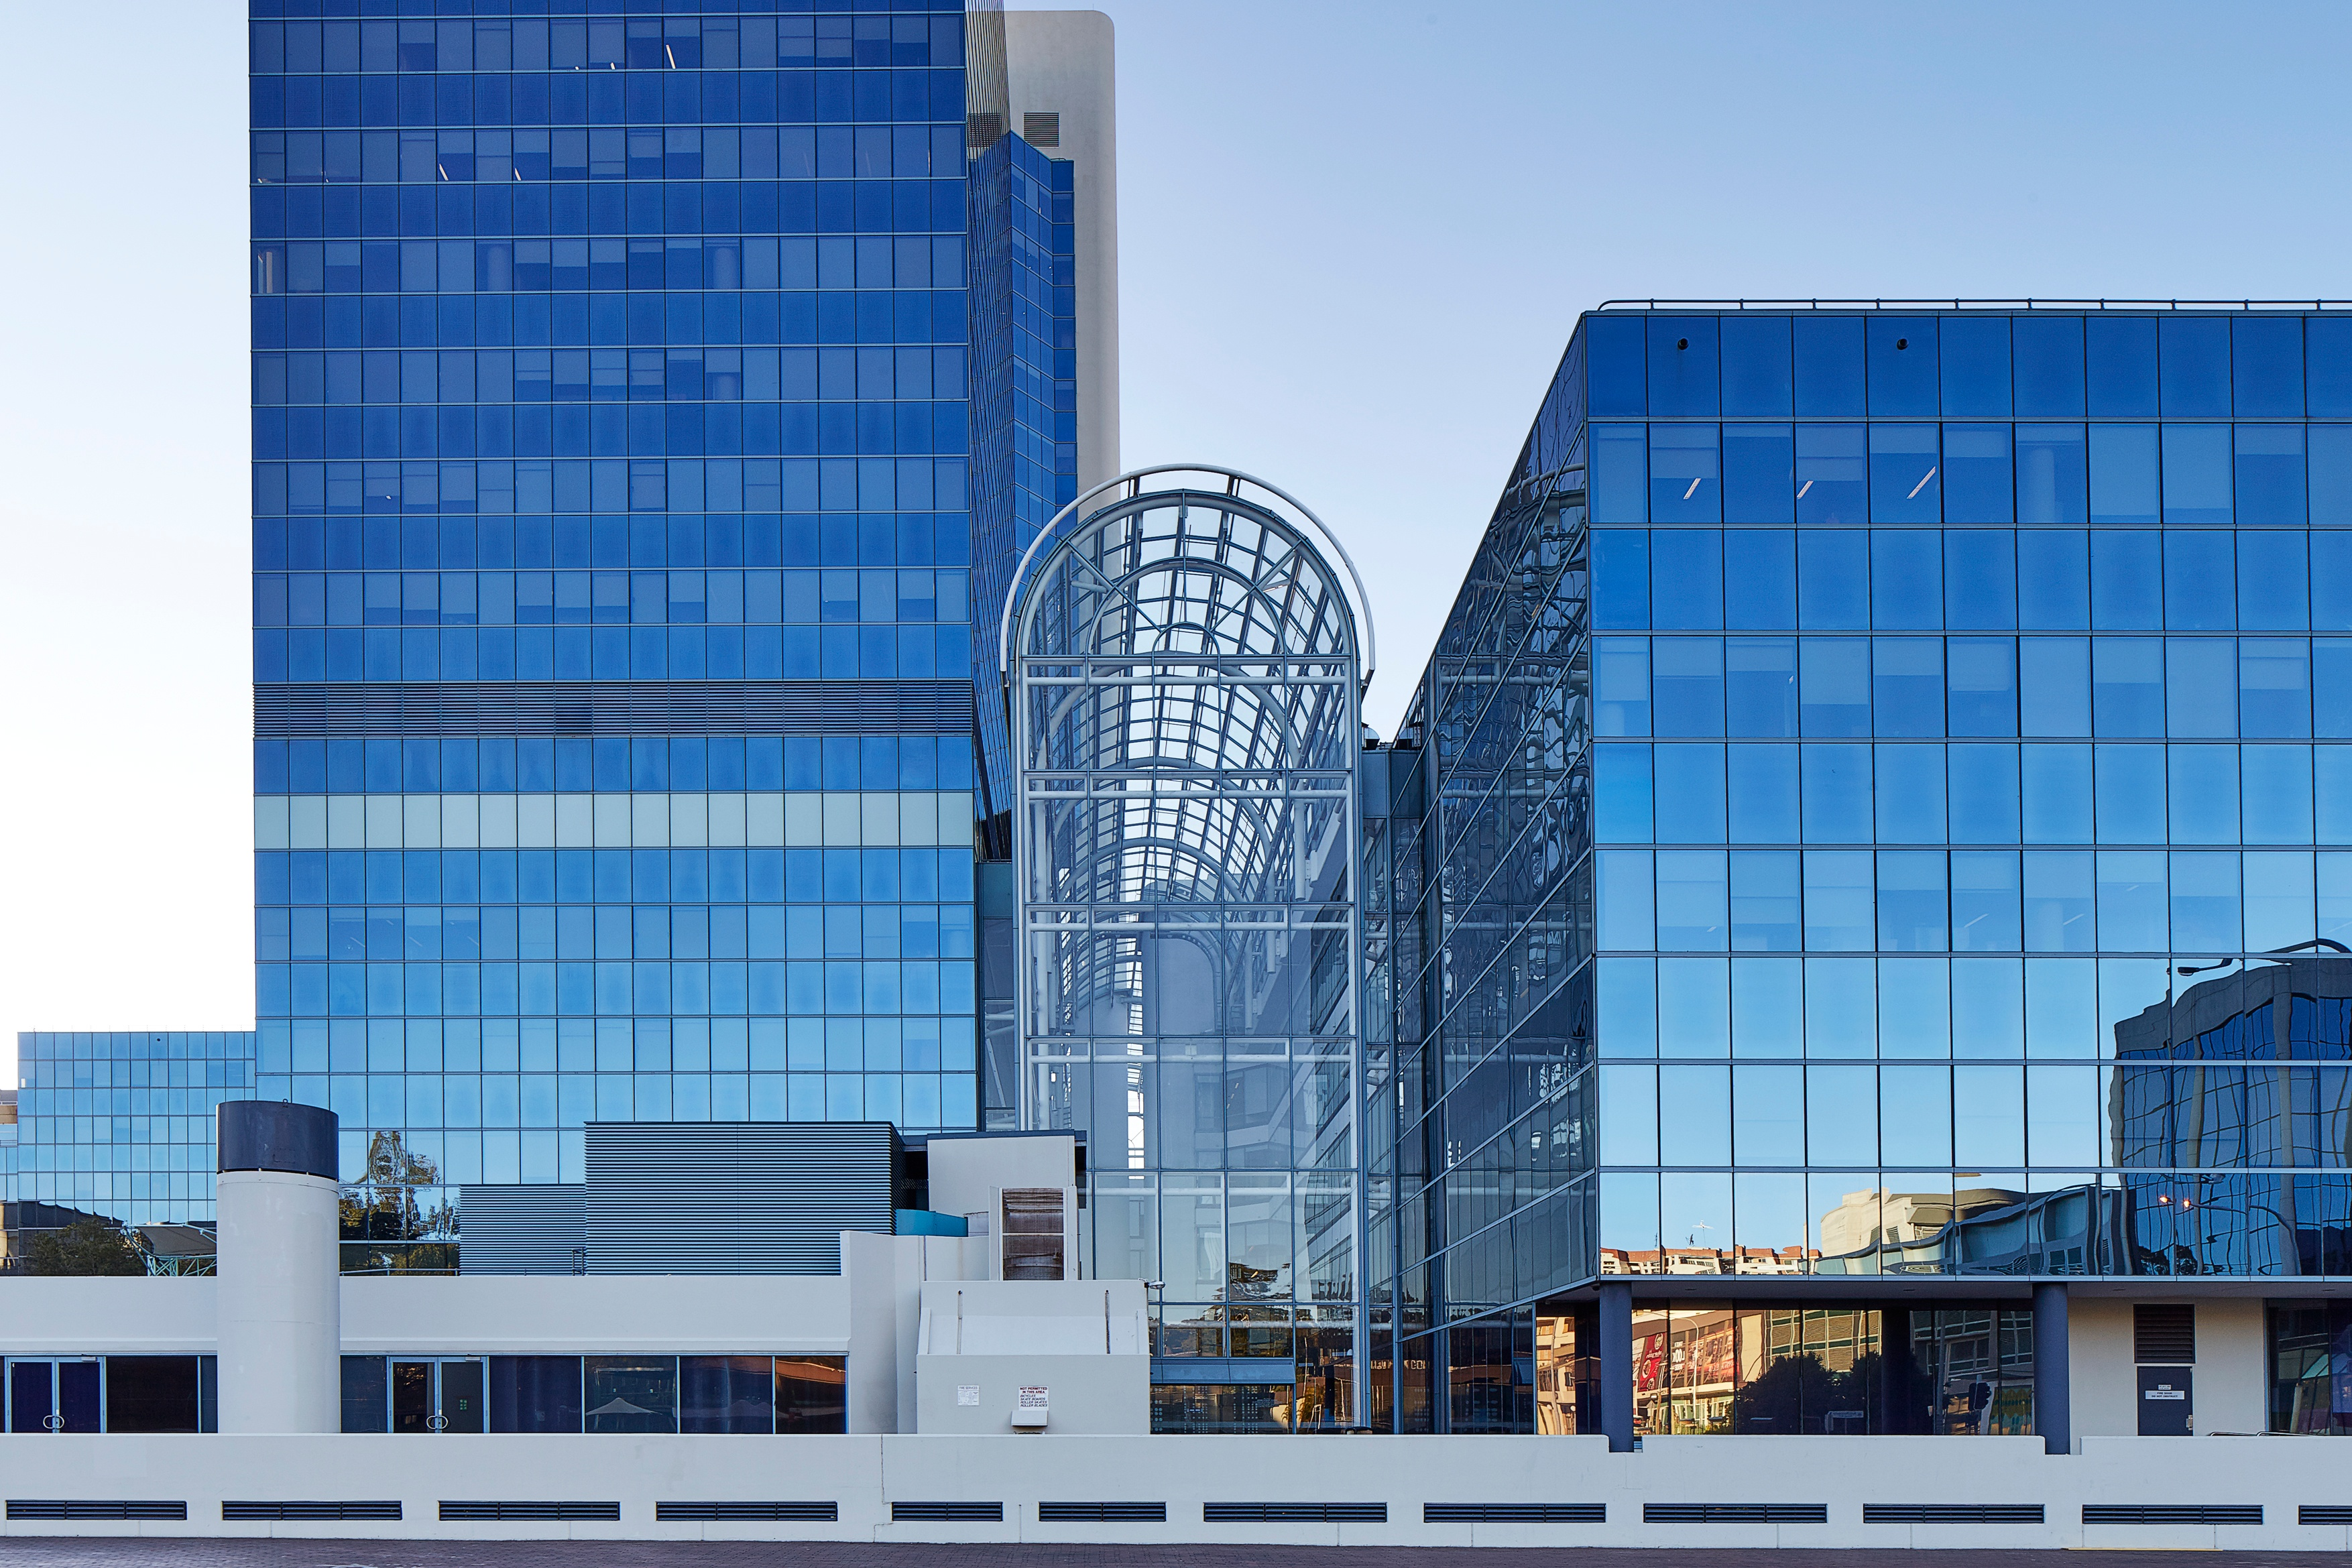 Hanson Paramatta Fitout Tenant Representation, Interior Design, Project & Construction Management Project Image 2 by PCG